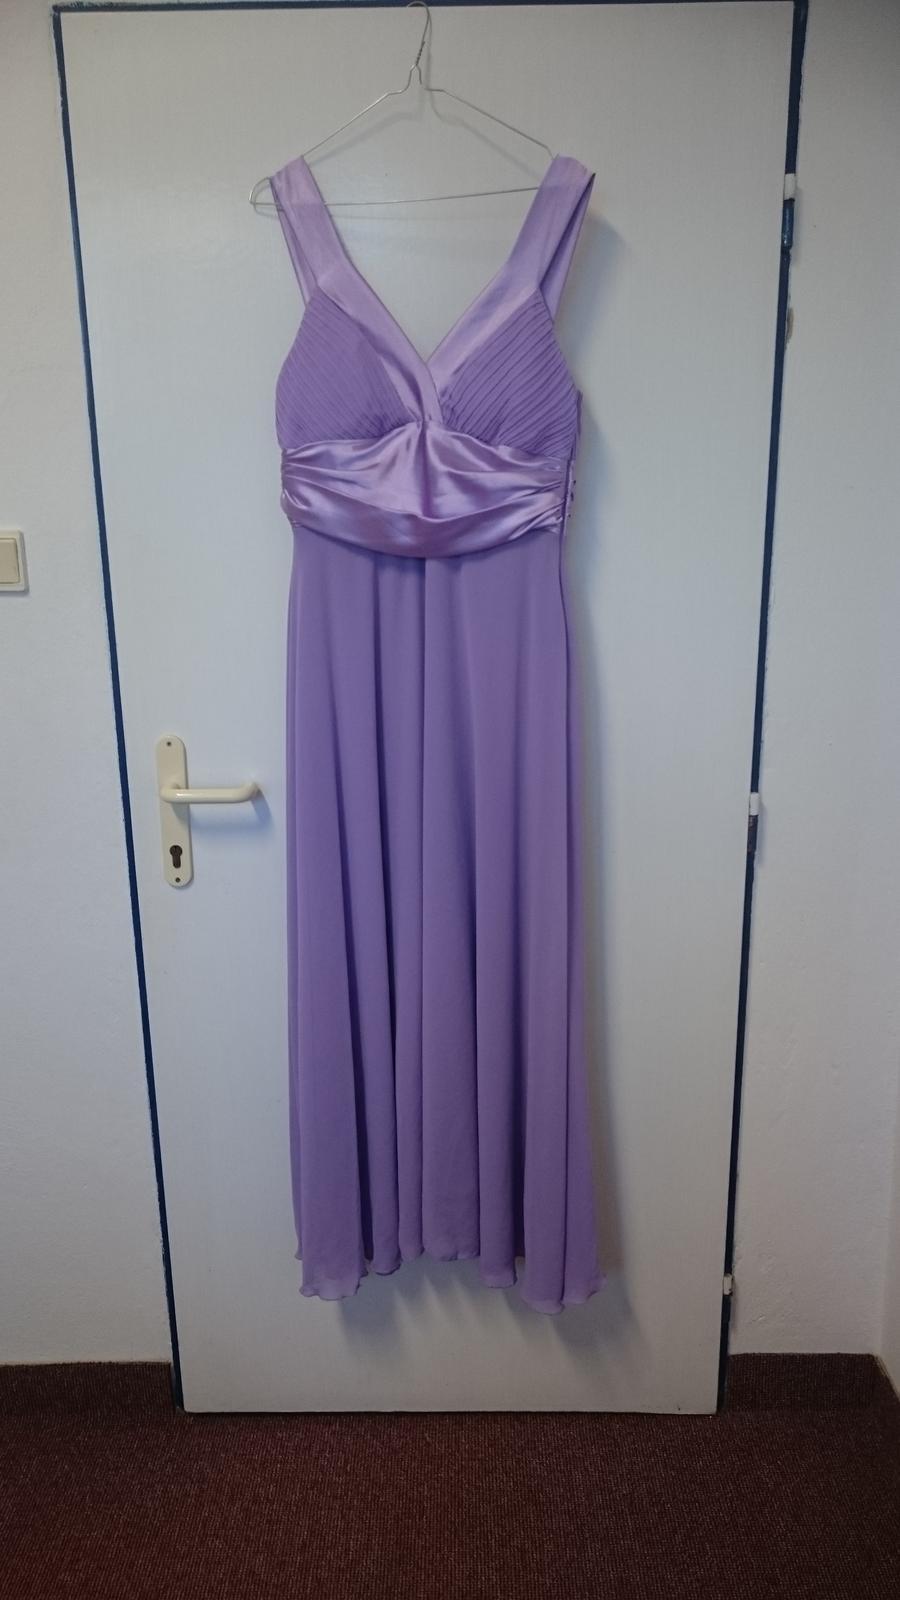 Fialové spoločenské šaty - Obrázok č. 1